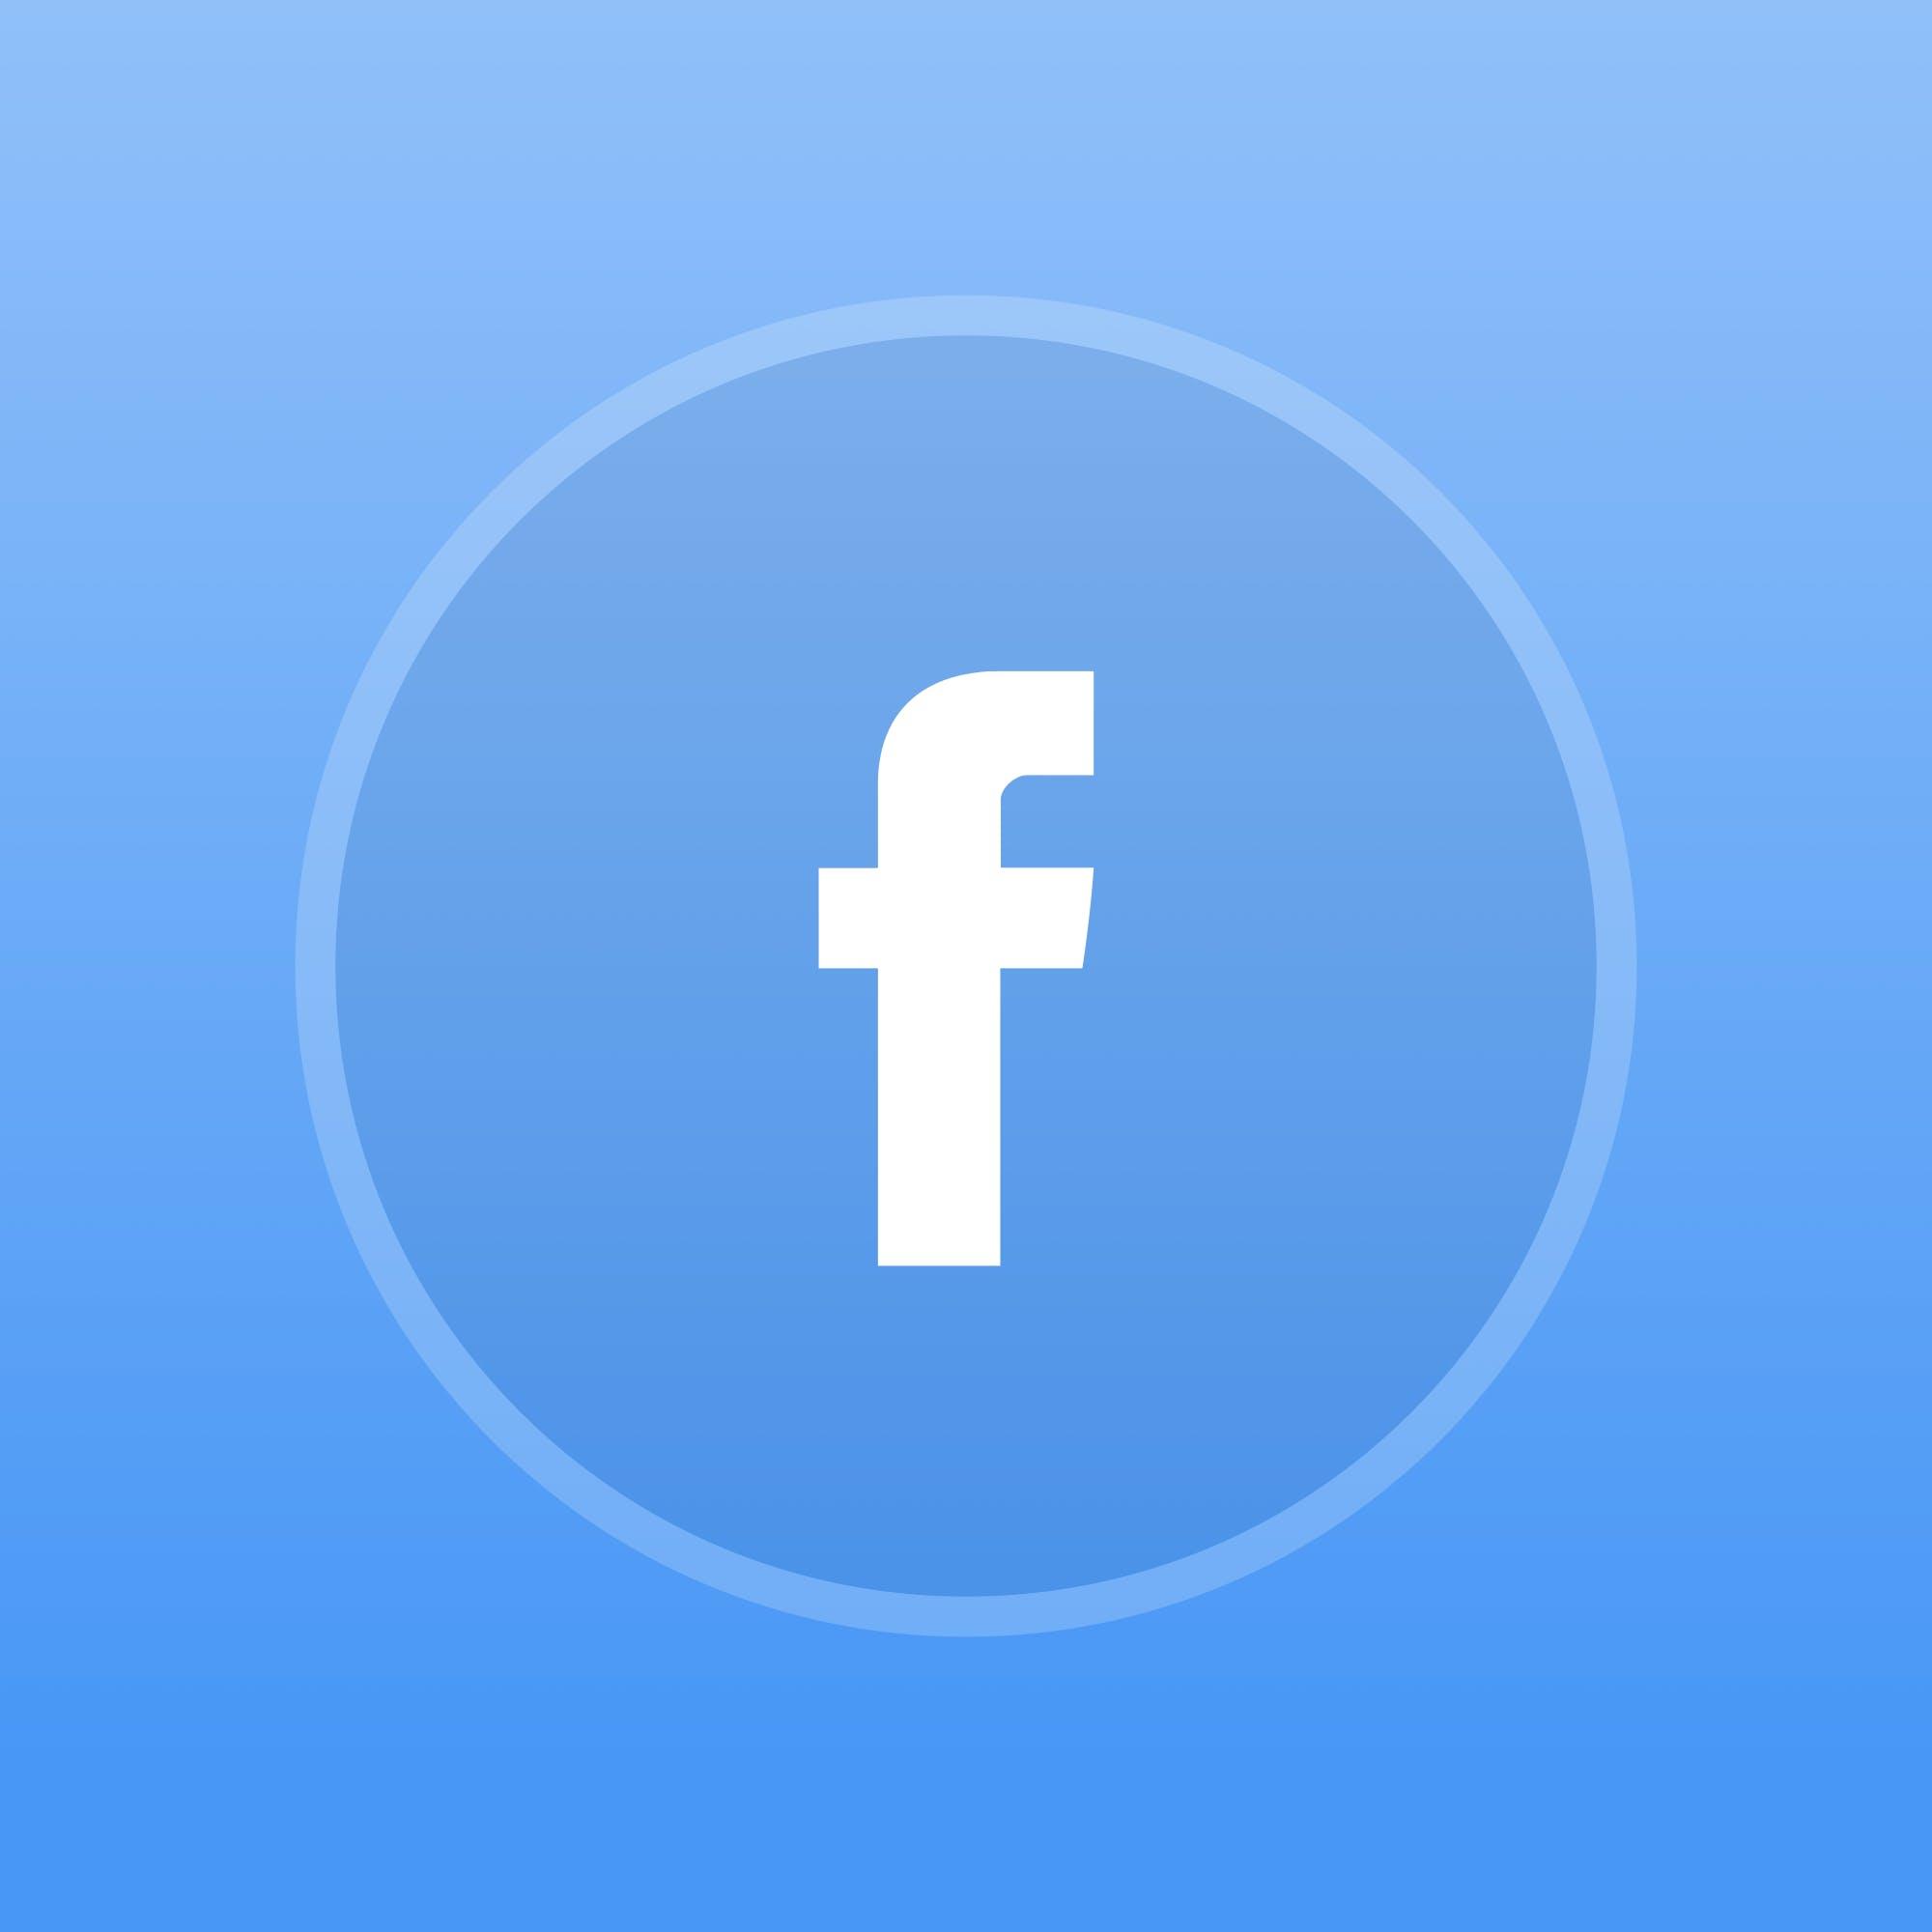 yobet体育官网Facebook评论的梅利亚审查